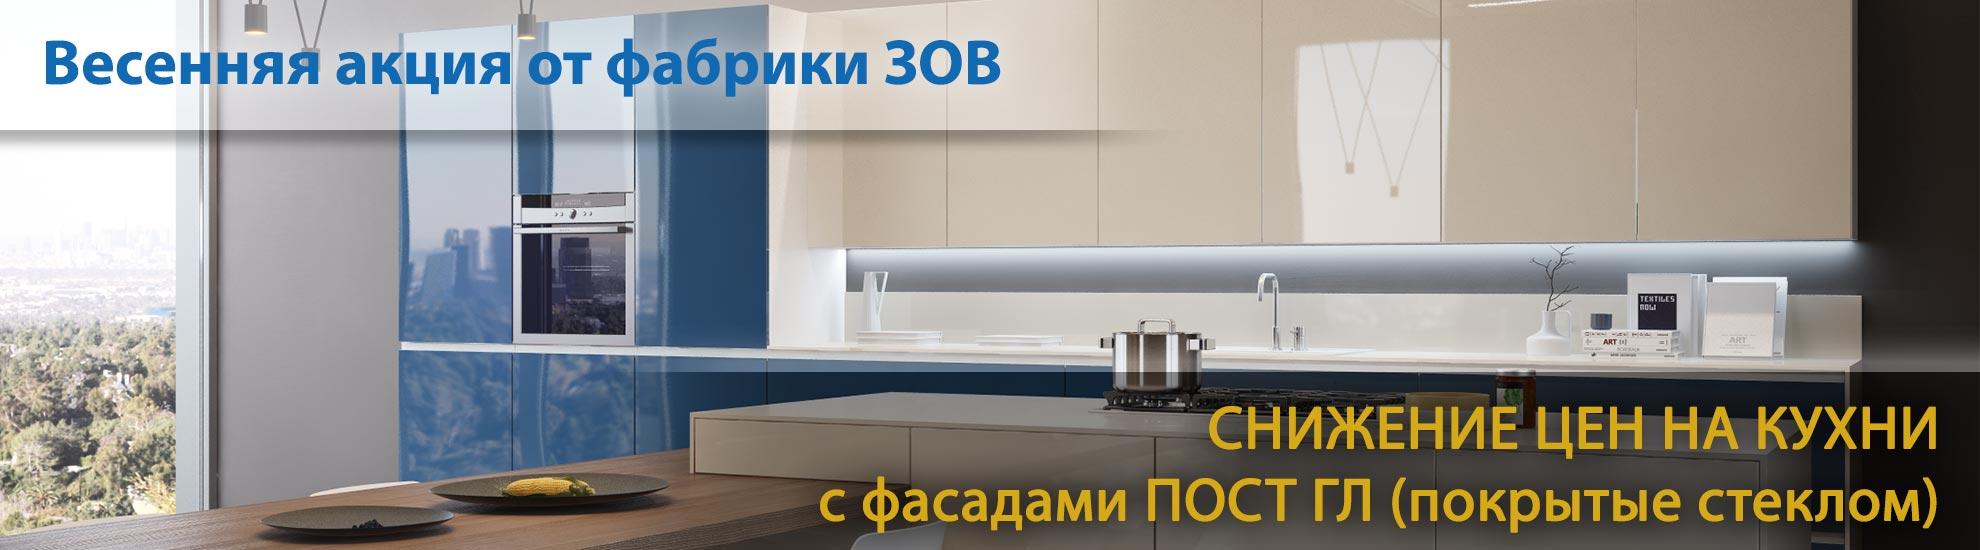 0001980_550